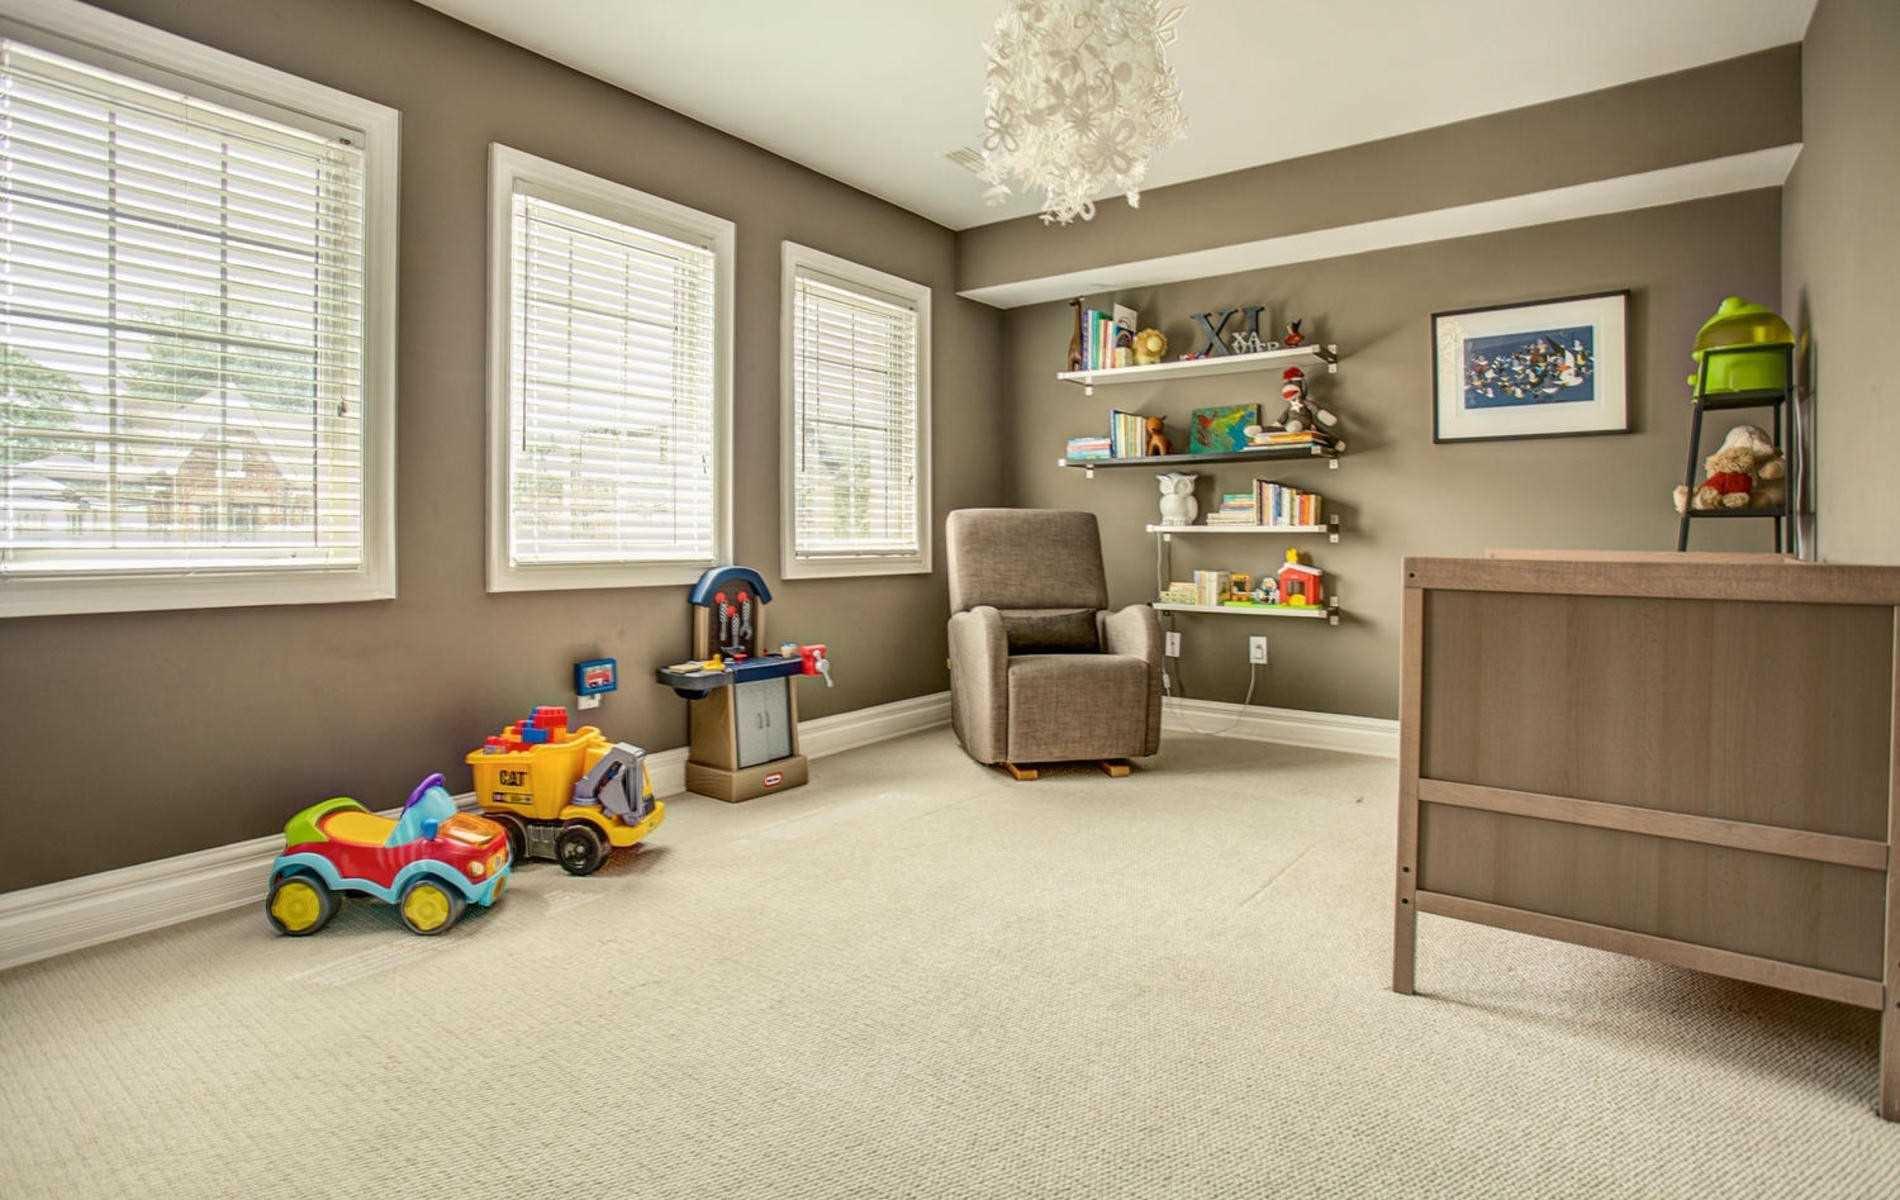 Photo 17: Photos: 119 Carlaw Avenue in Toronto: South Riverdale House (3-Storey) for lease (Toronto E01)  : MLS®# E4386176